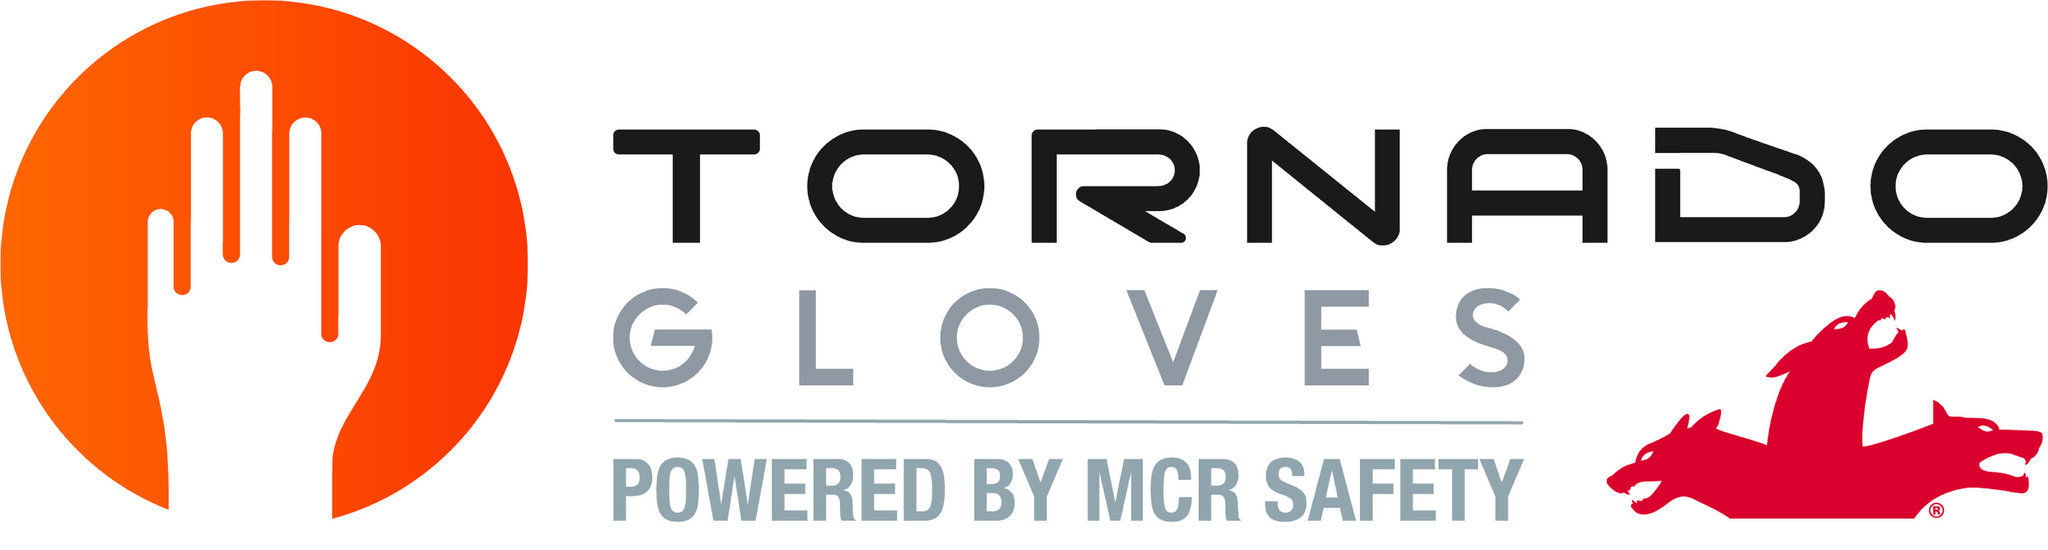 Tornado Gloves Limited